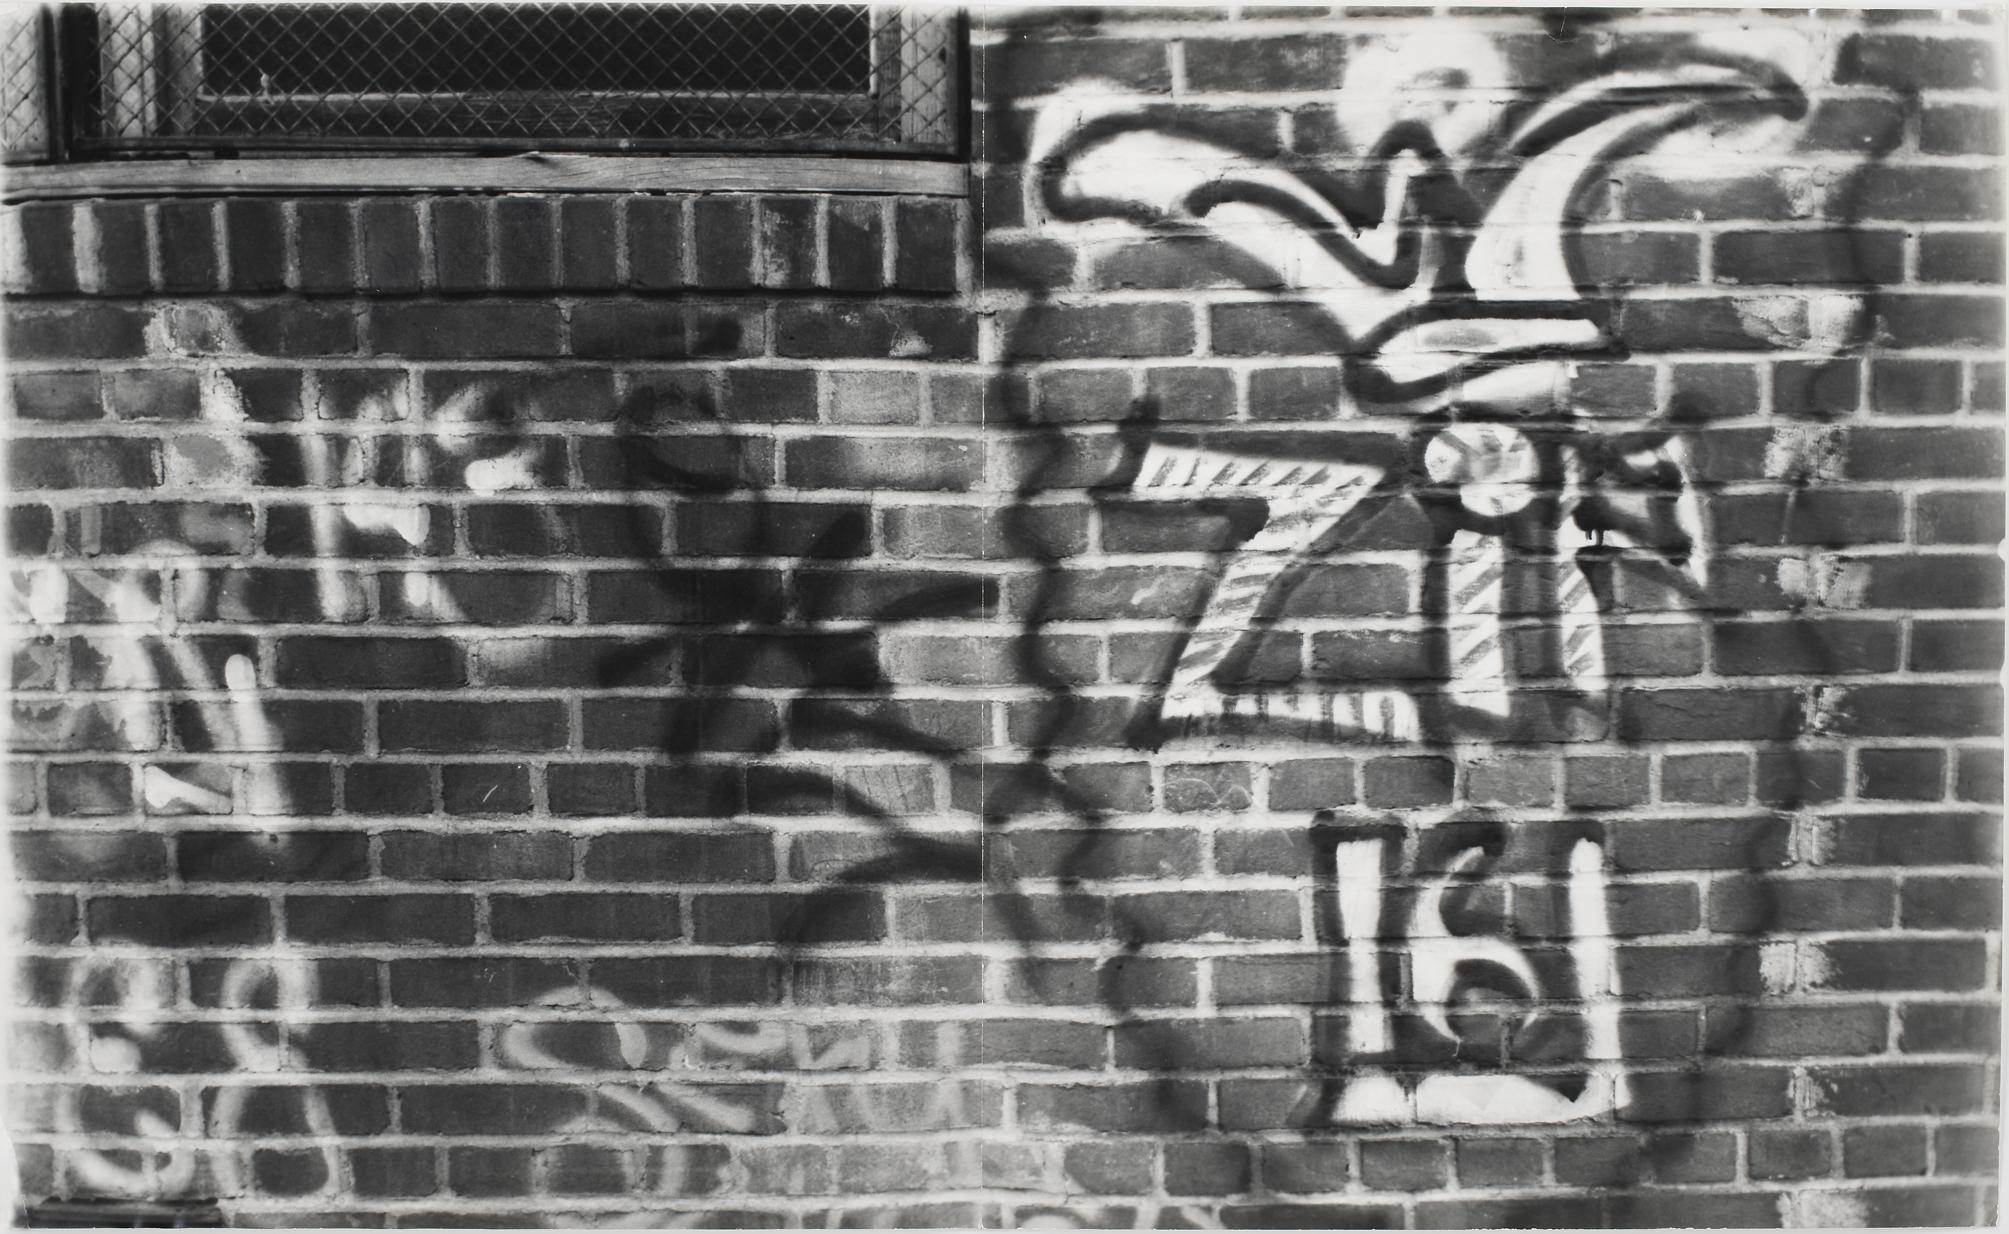 Gordon Matta-Clark Graffiti, 1973. Courtesy The Estate of Gordon Matta-Clark et David Zwirner, New York / Londres / Hong Kong. © 2018 The Estate of Gordon Matta-Clark / ADAGP, Paris